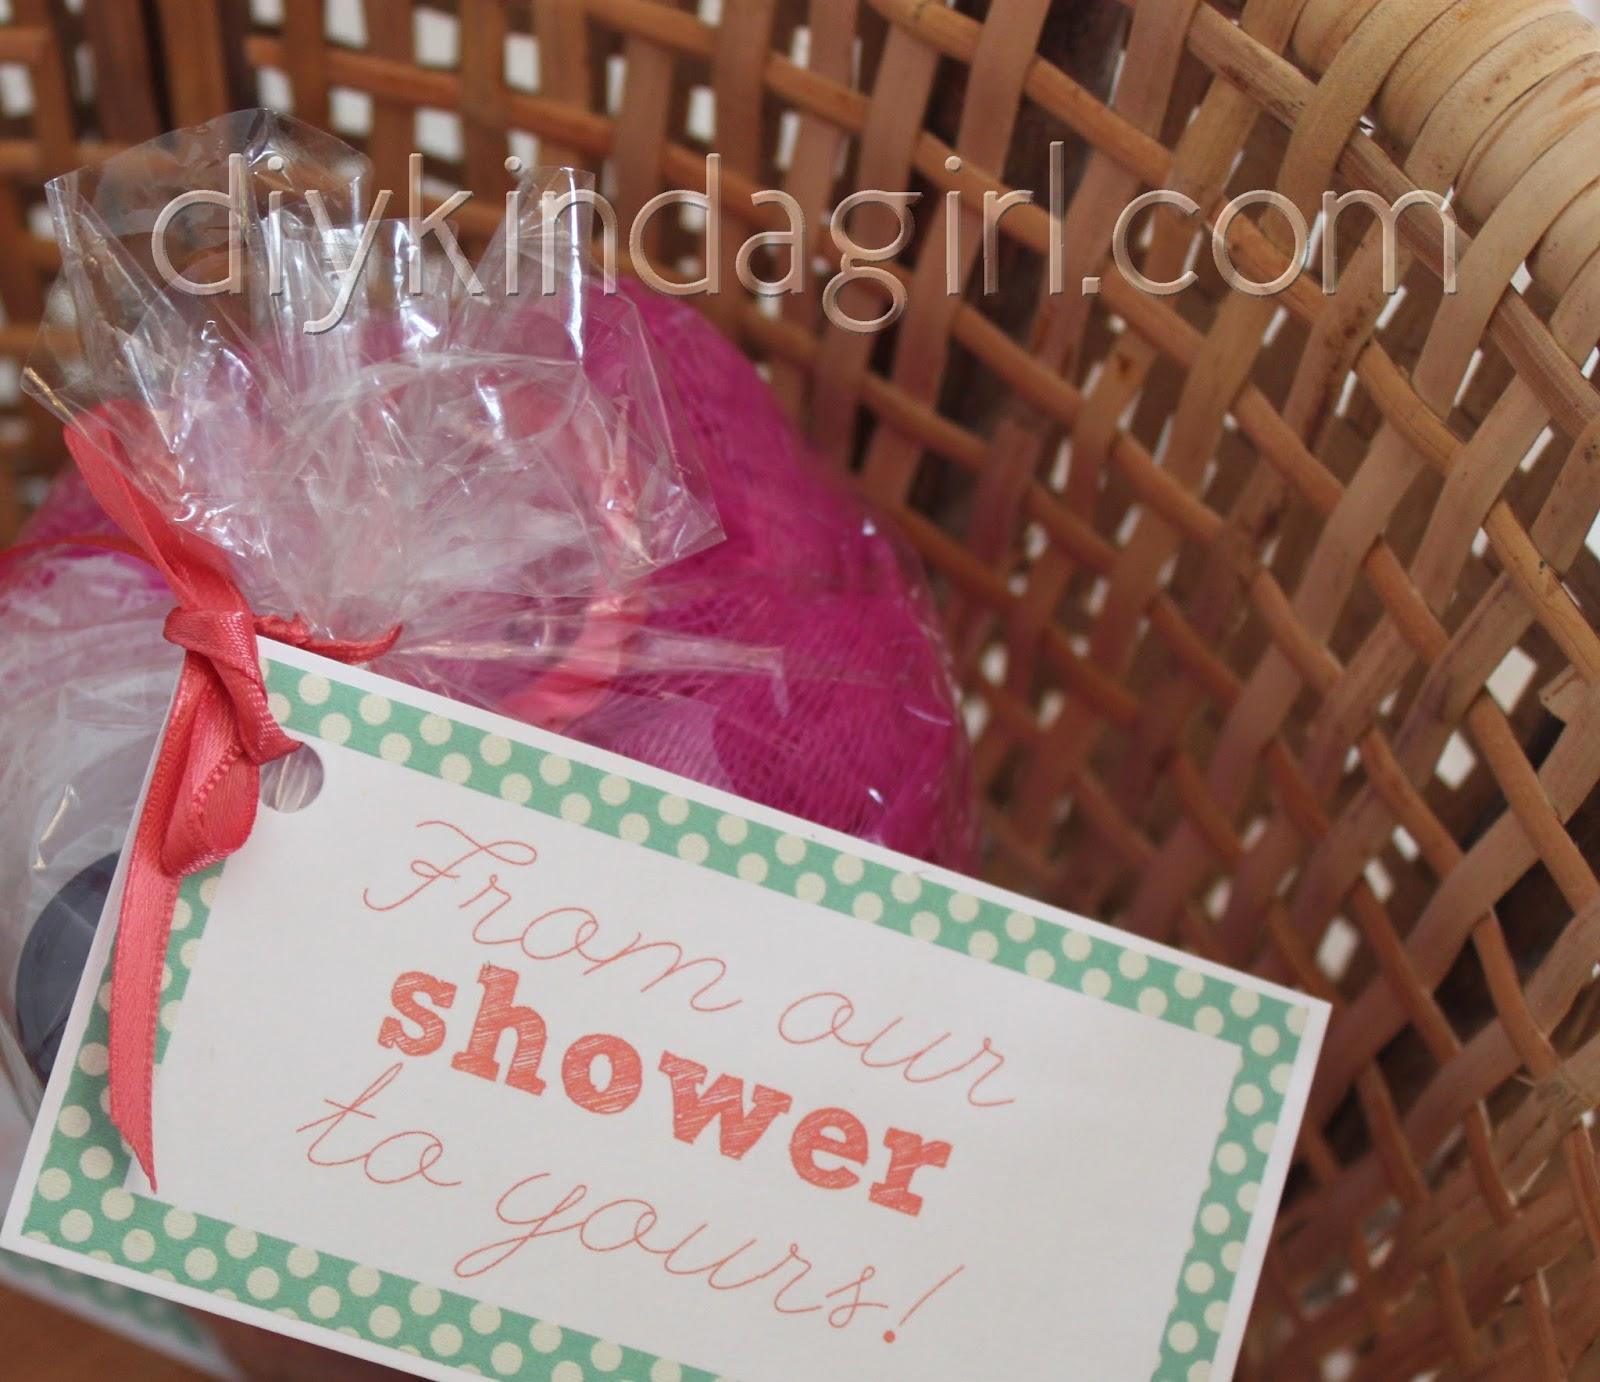 Baby Shower Prizes For Game Winners: DIY Kinda Girl: Baby Shower For C